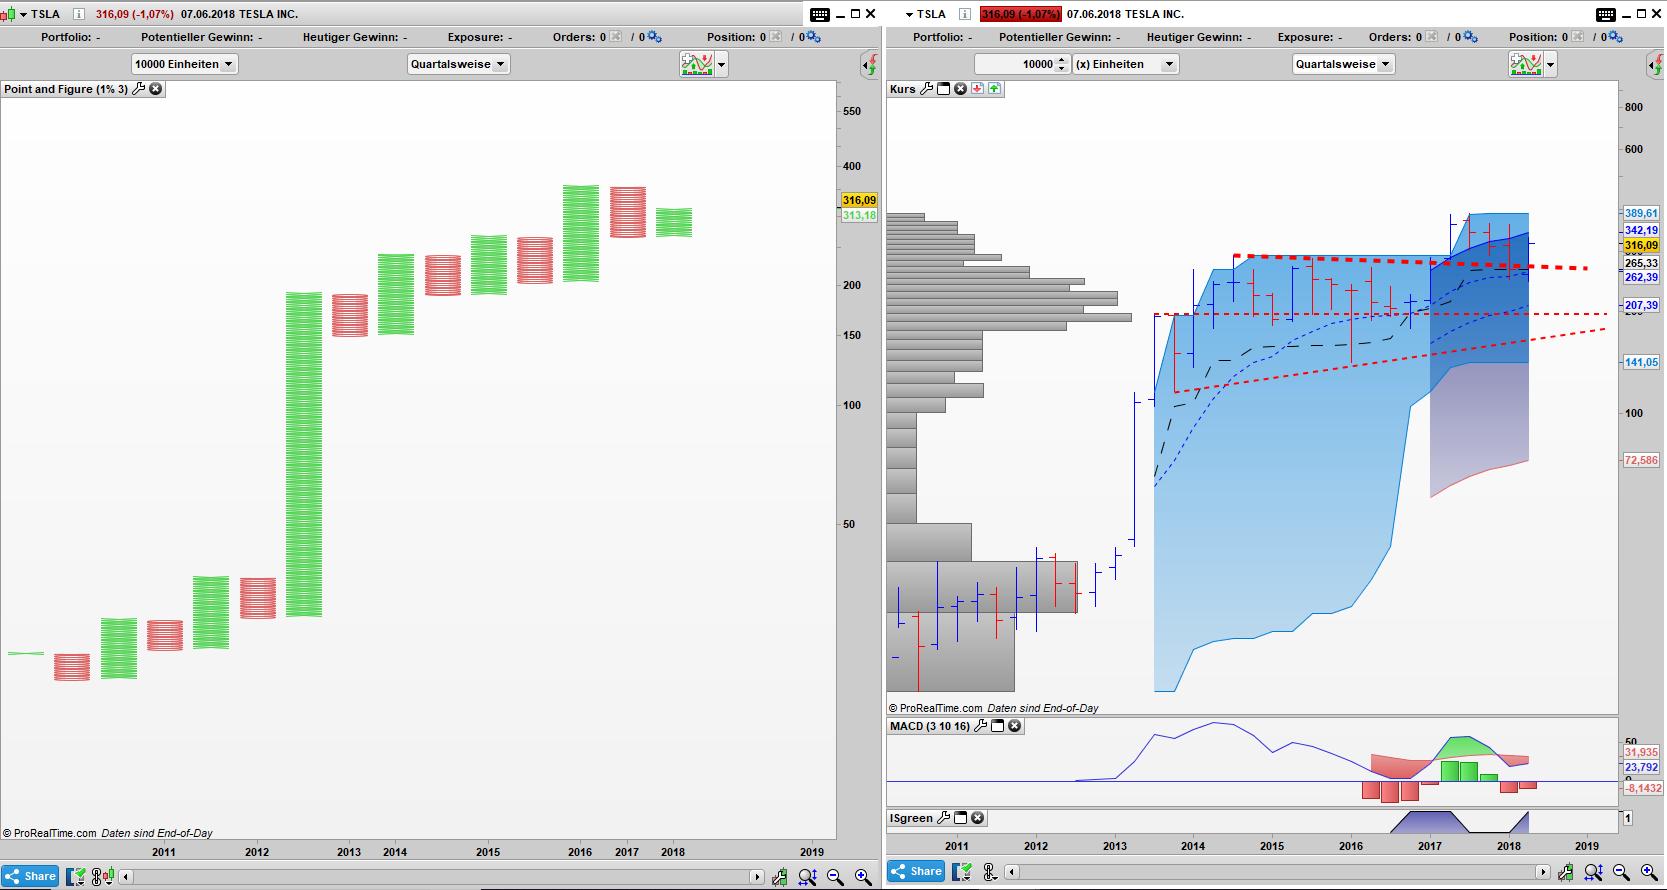 TSLA Point and Figure & Bar Quartals Chart: Alles ist gut